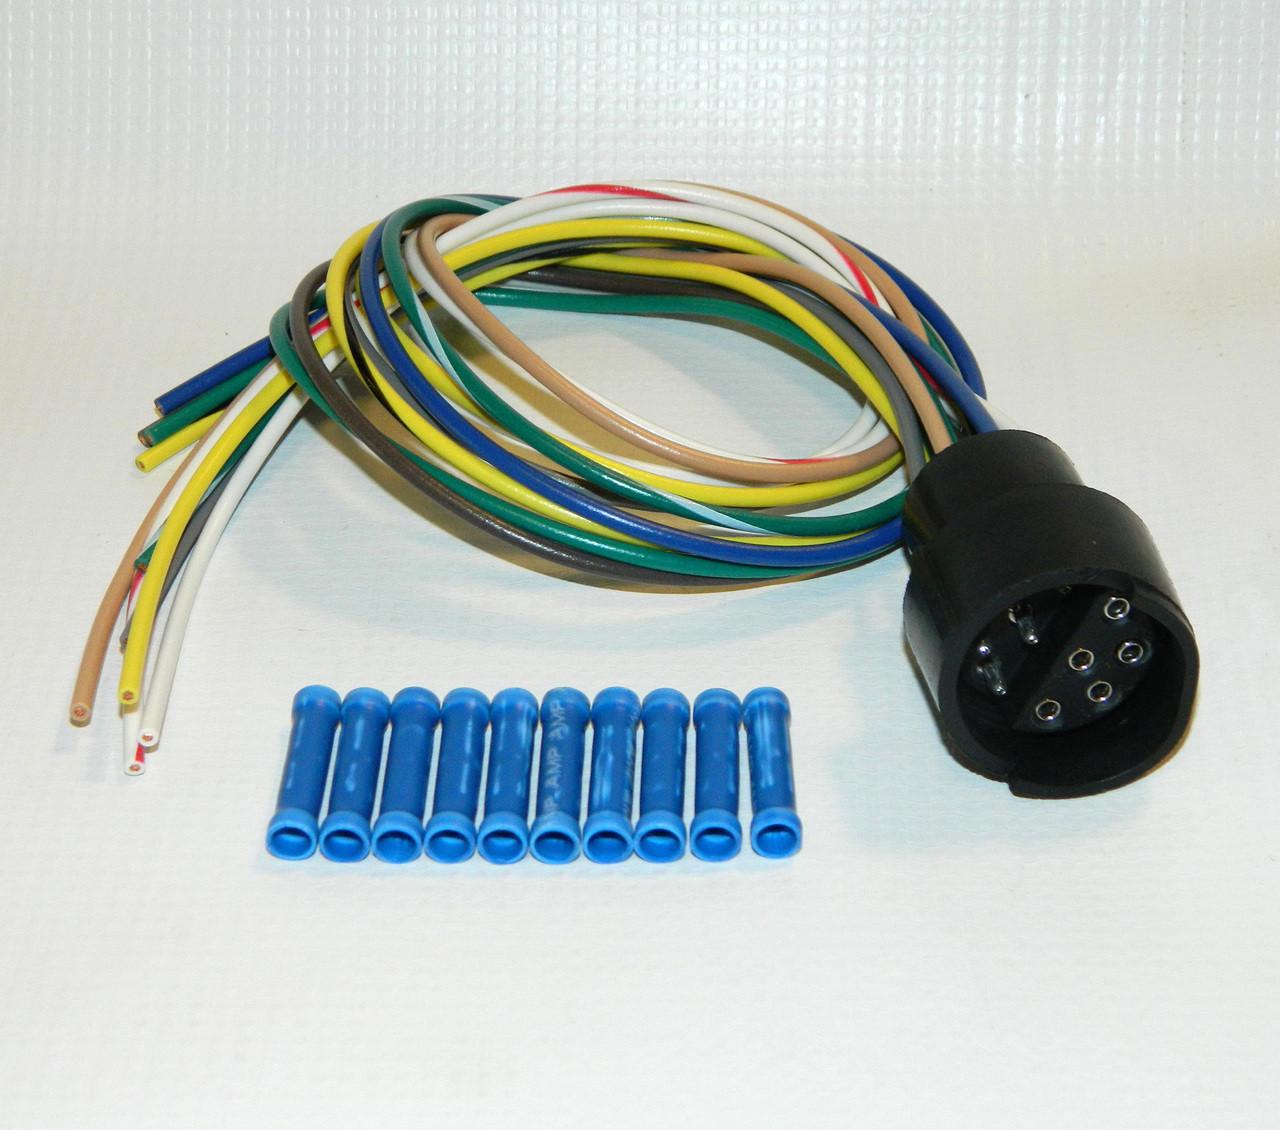 hn38813075 hiniker plow side 10 pin pigtail repair kit croft rh crofttrailer com hiniker wiring diagram hiniker snow plow wiring schematic [ 1280 x 1130 Pixel ]